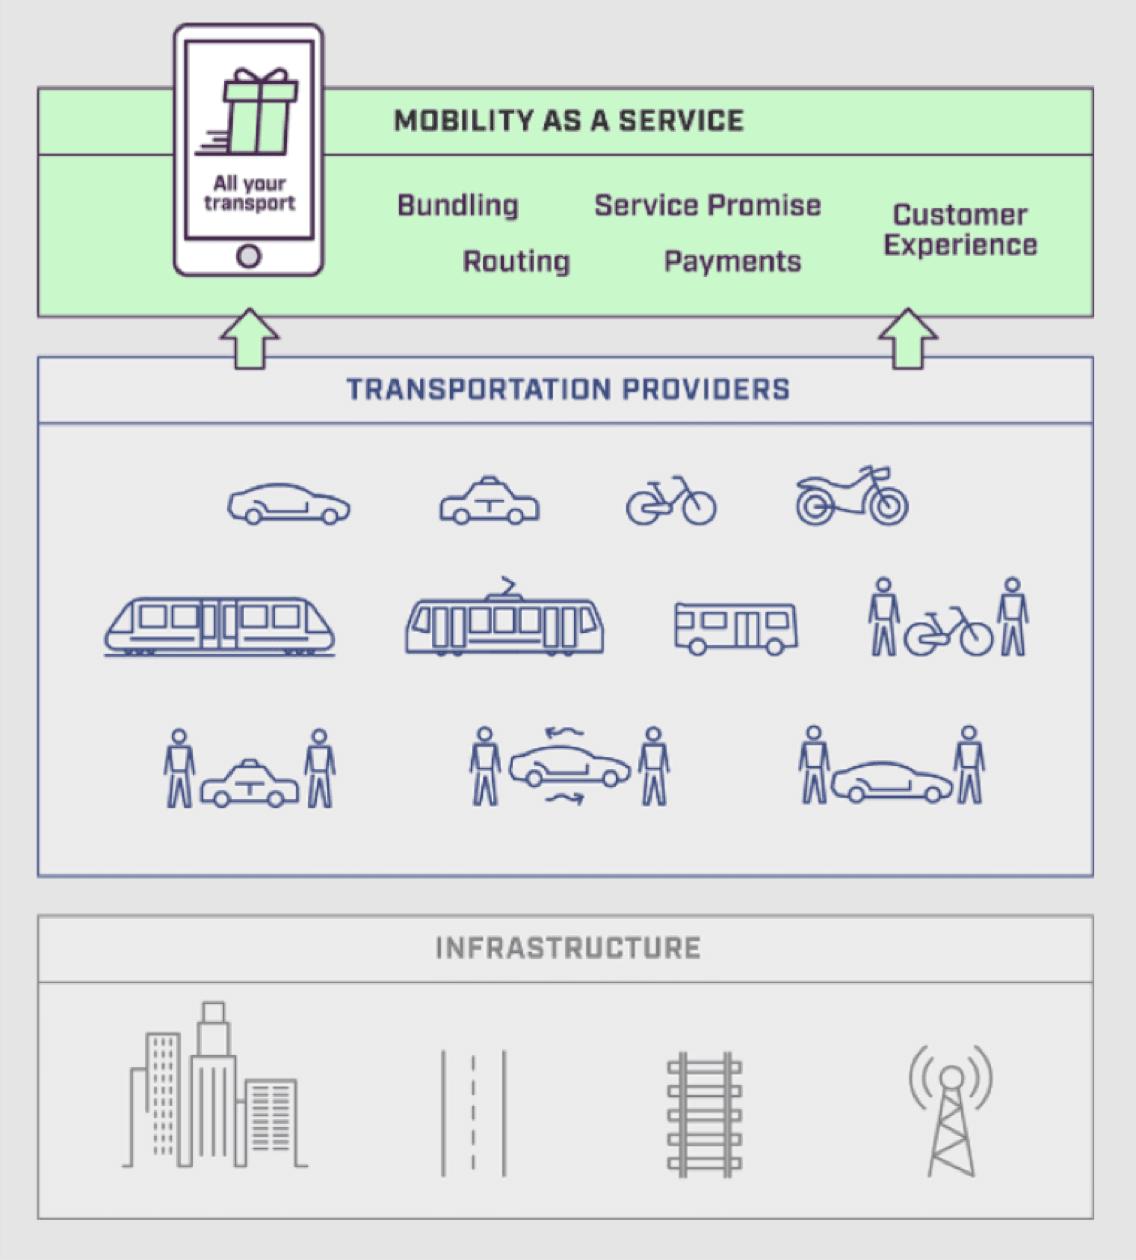 Mobility as a service diagram